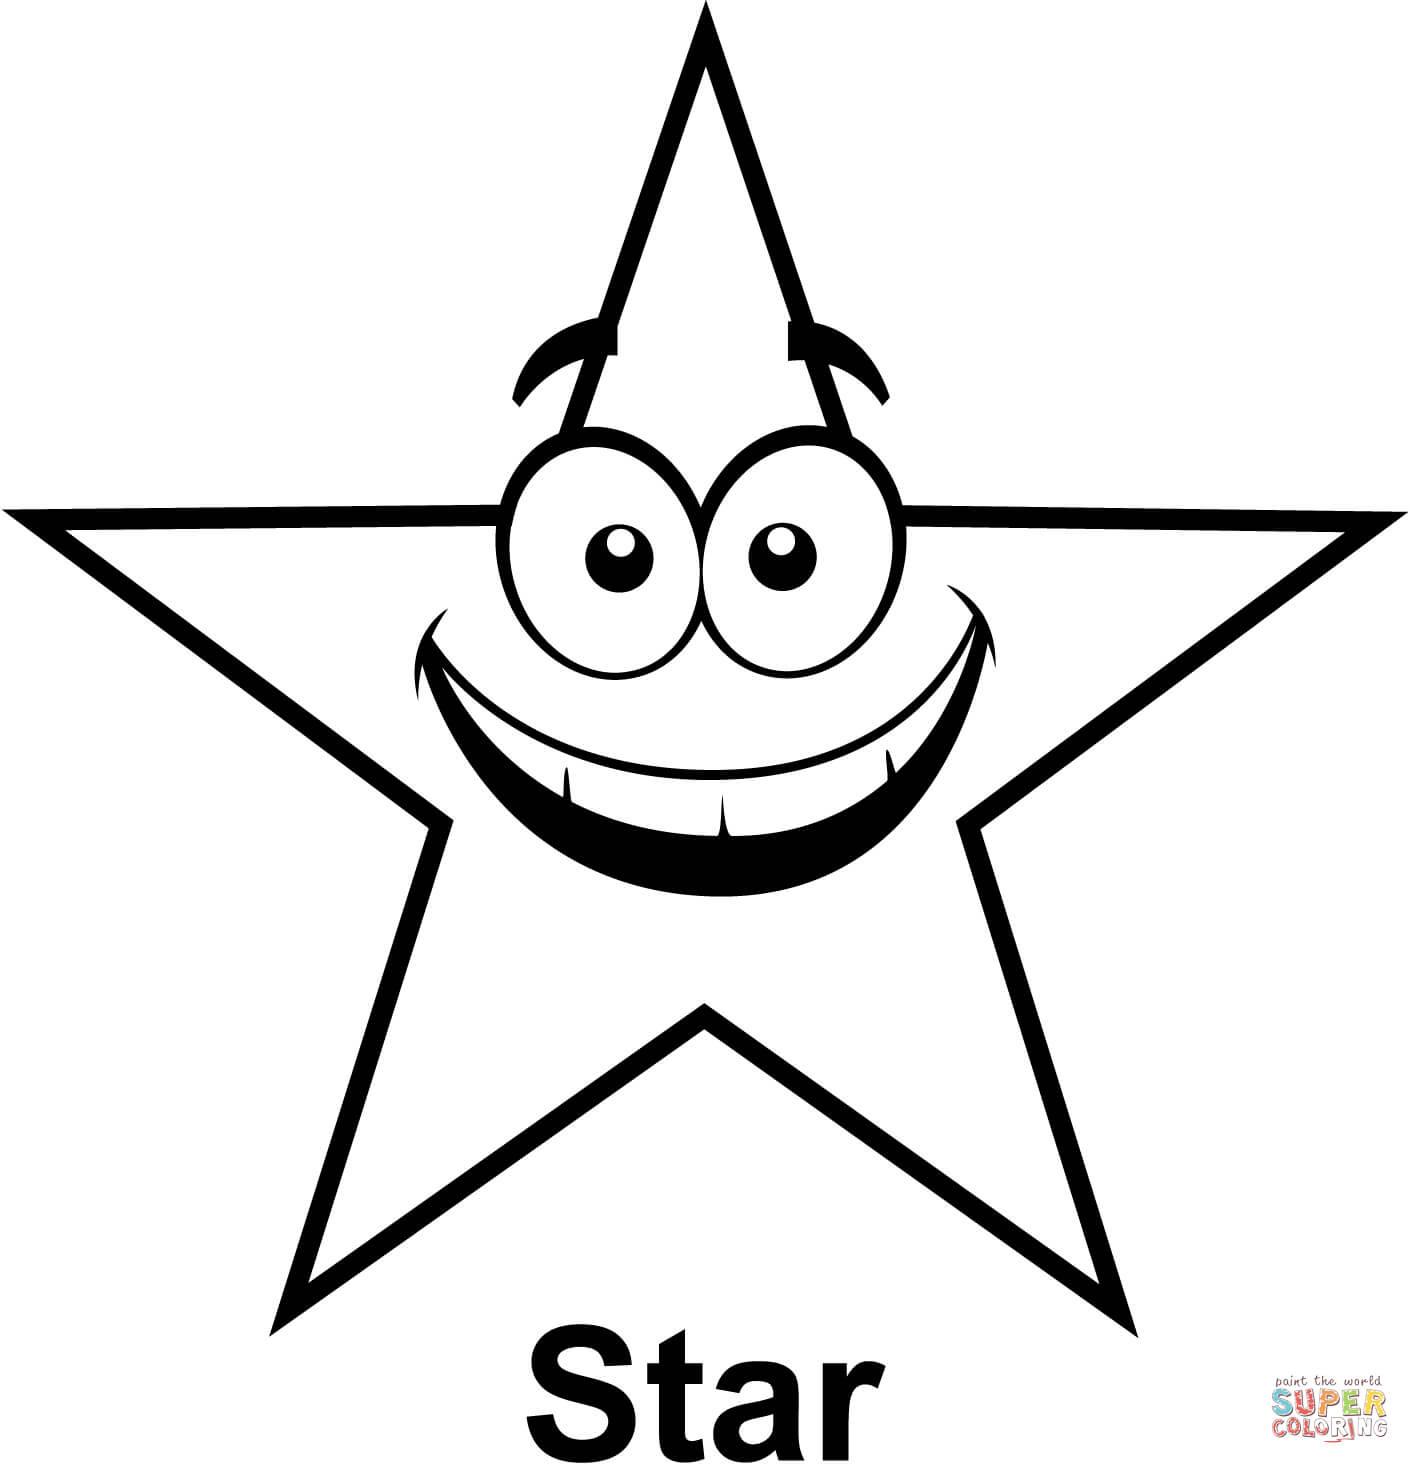 Estrela Para Colorir E Imprimir Muito Facil Colorir E Pintar